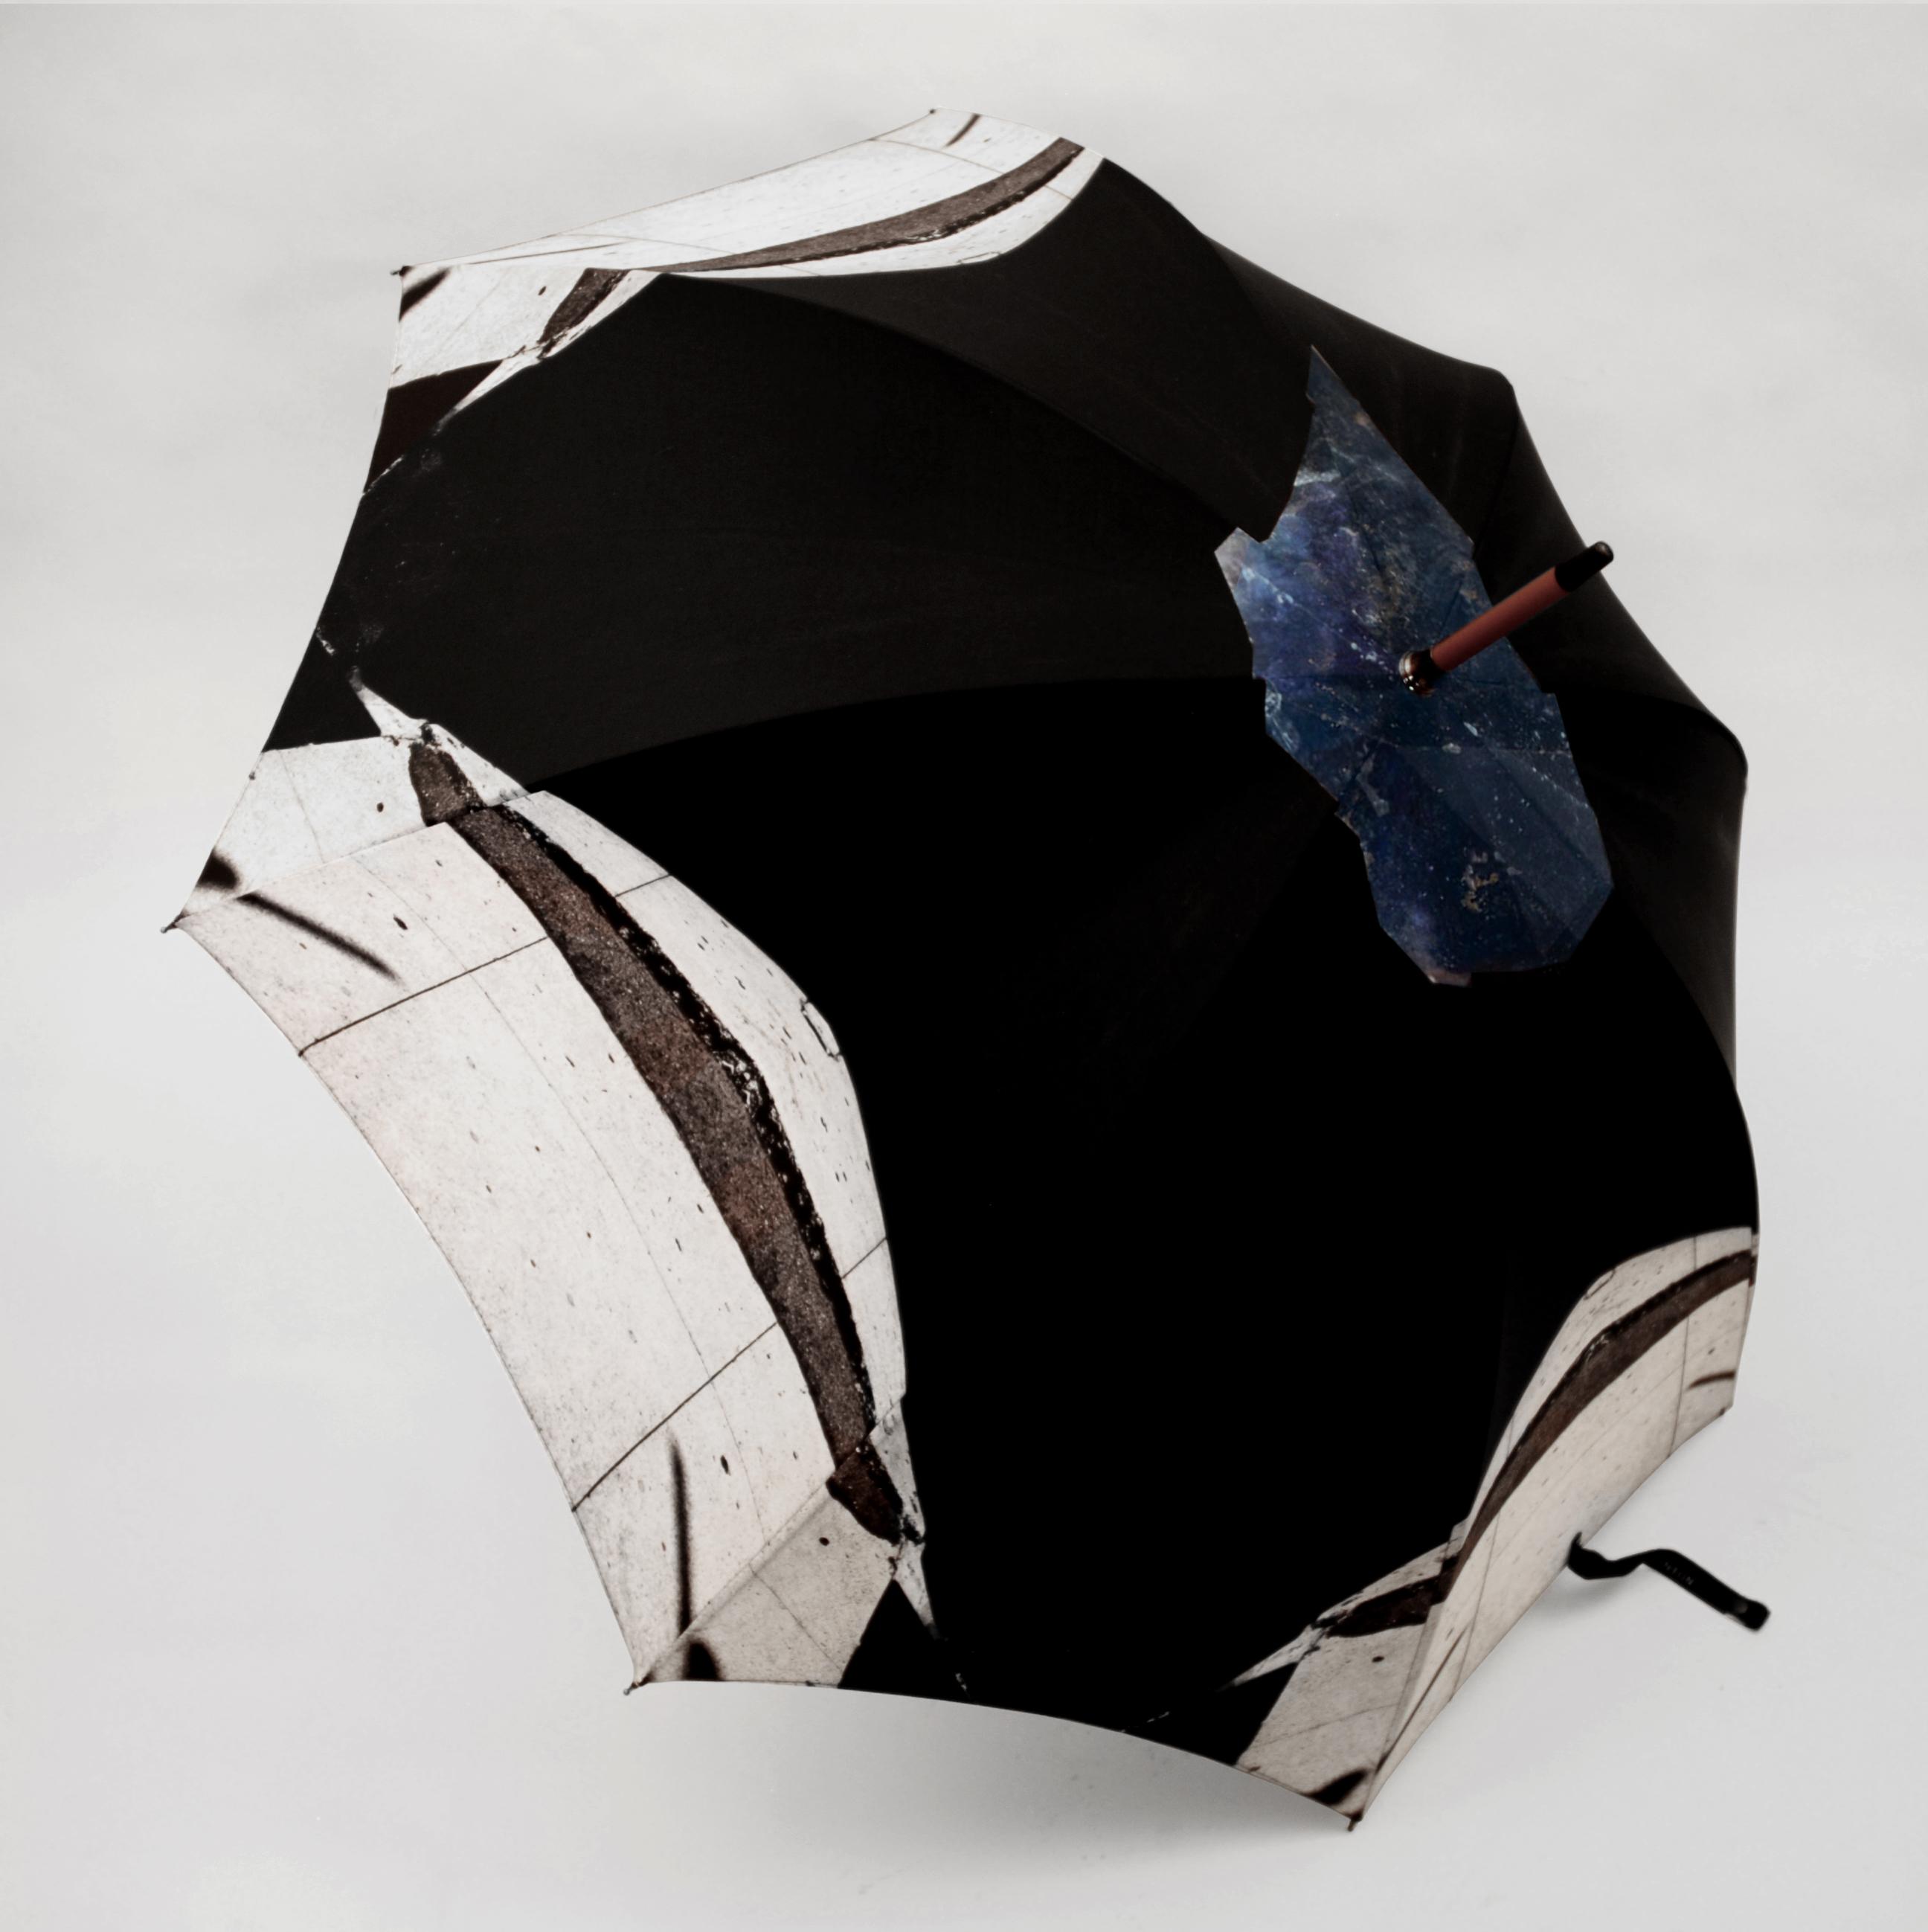 hannah stanton, drought fabric, fabric design, umbrella